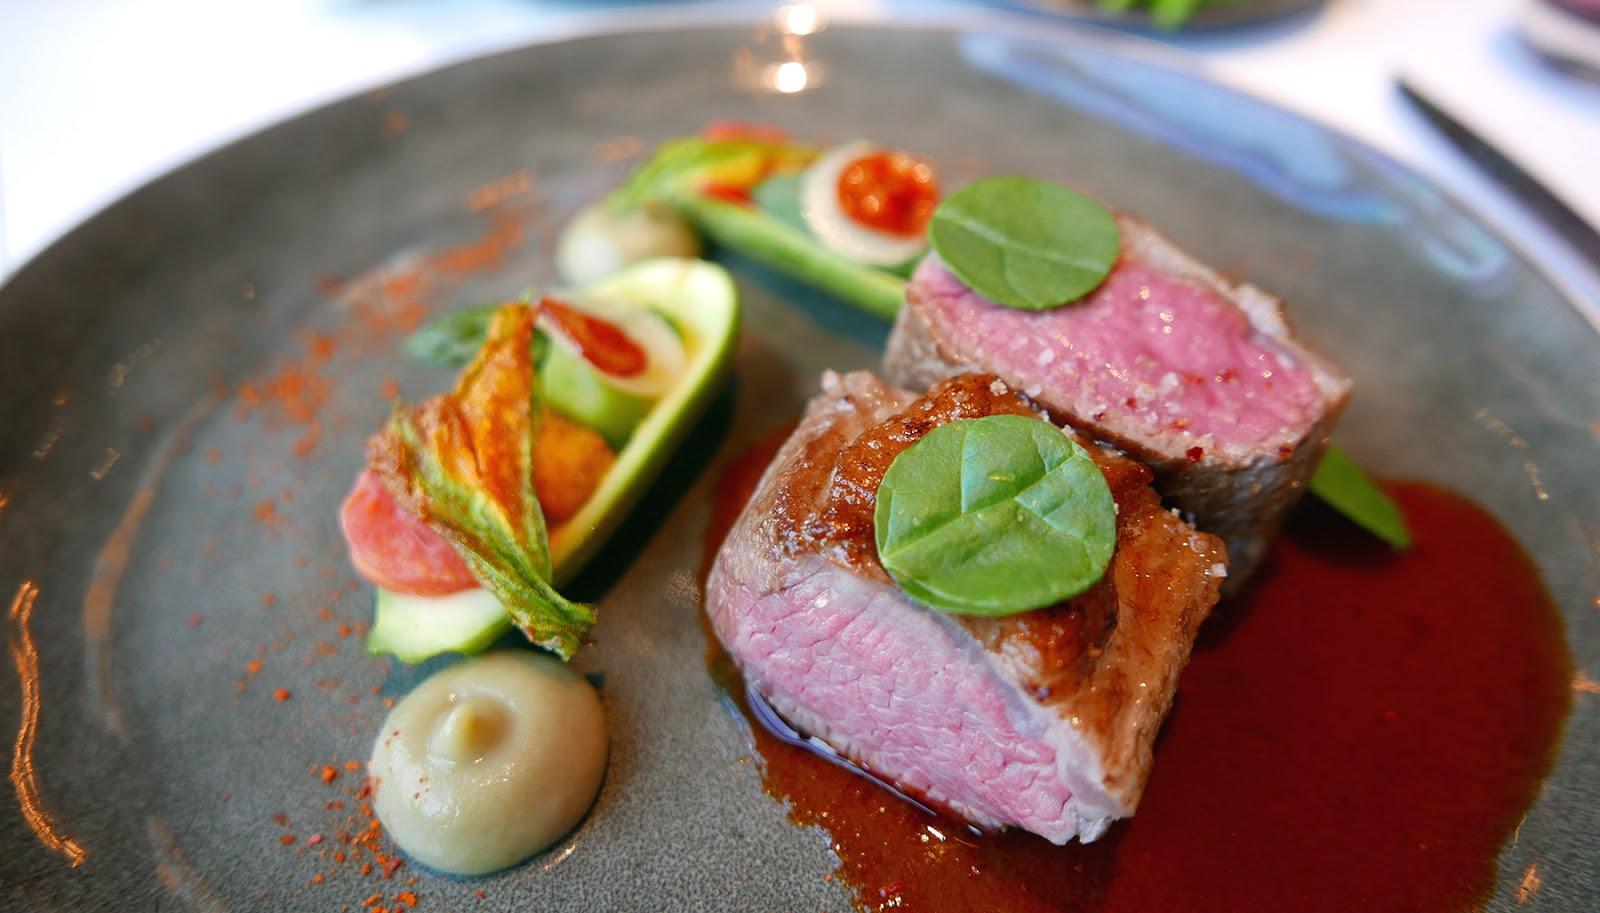 Euriental | luxury travel & style | dinner at Park Hyatt, Sydney, Australia